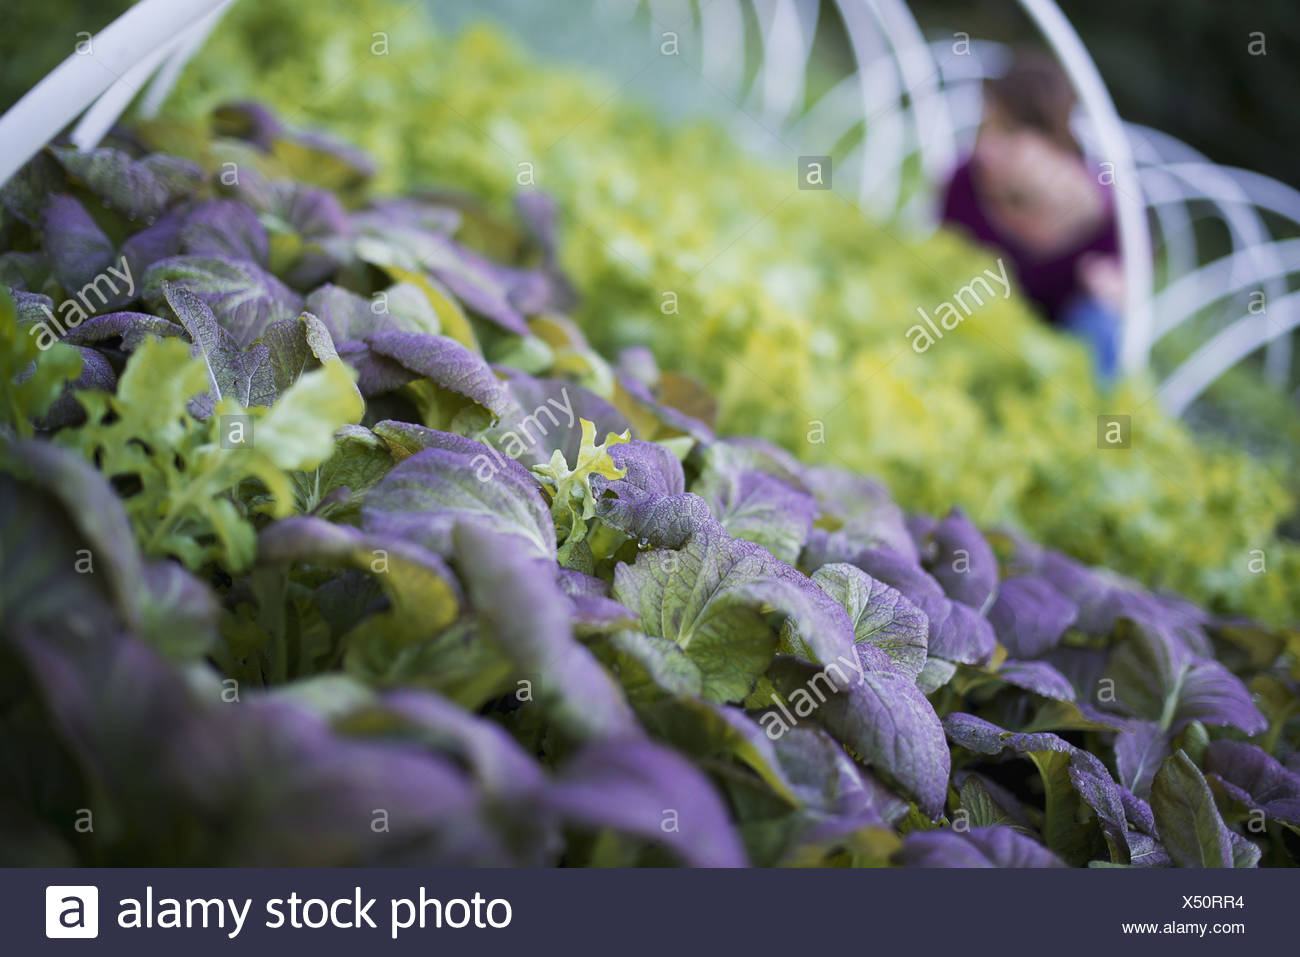 Woodstock New York USA farmer working among plants salad leaf vegetables - Stock Image